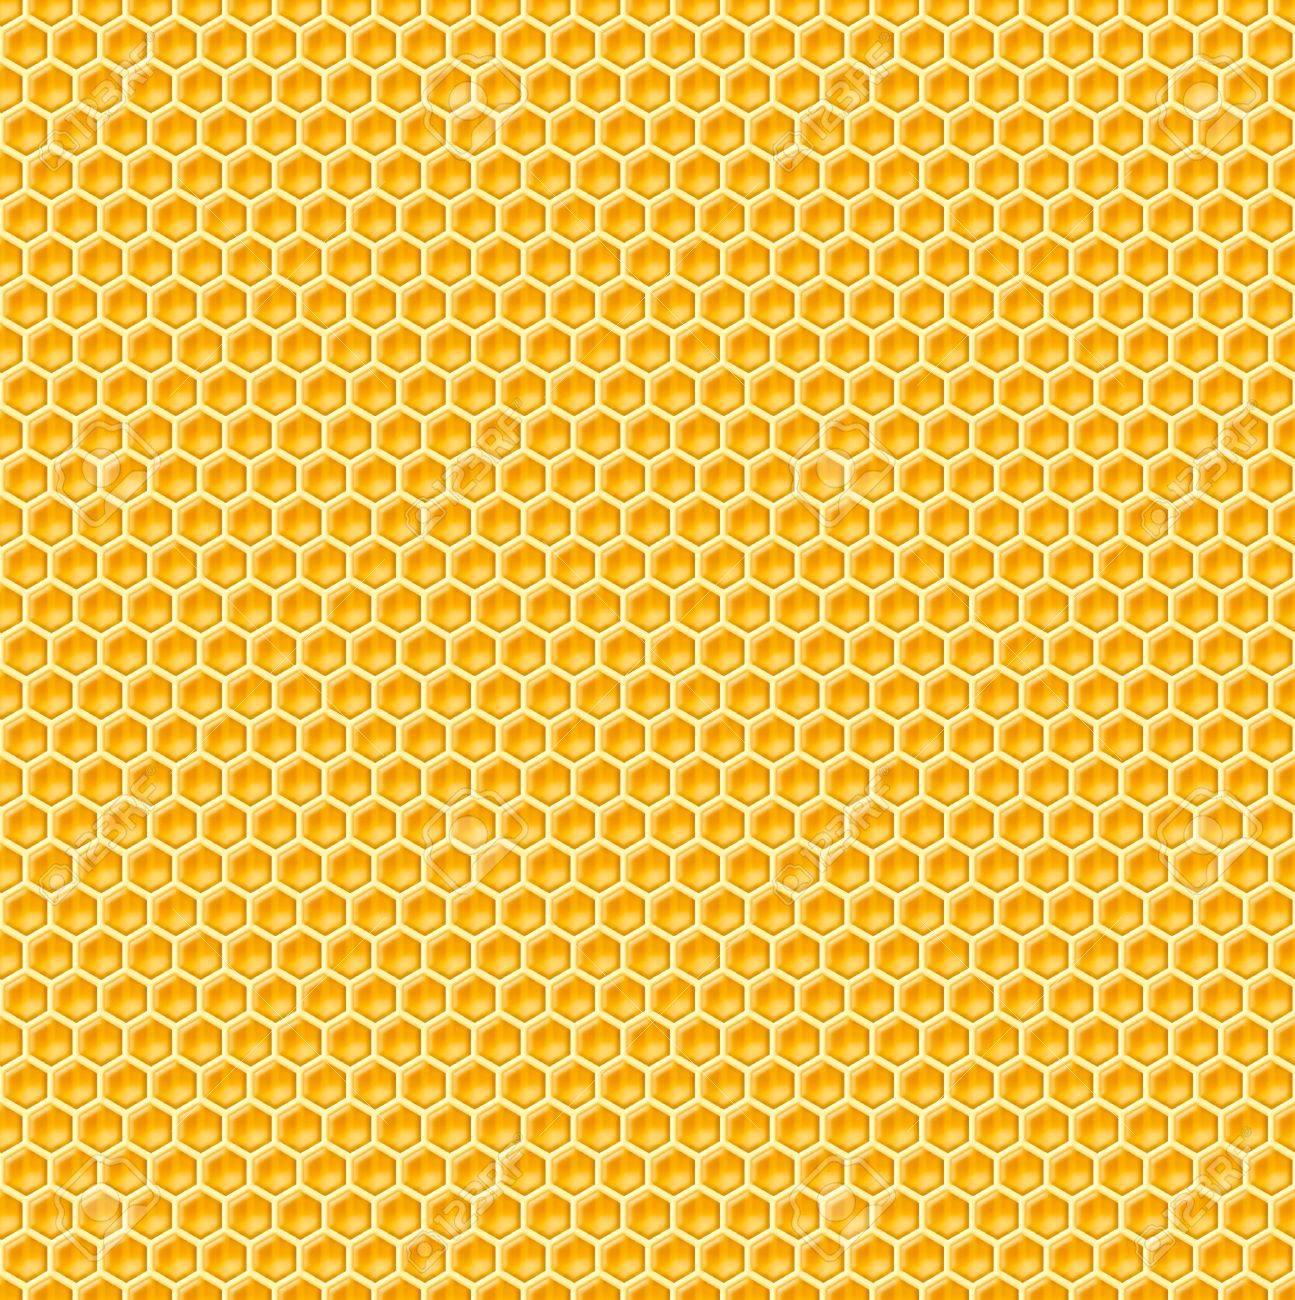 honeycomb seamless background Stock Photo - 15885625